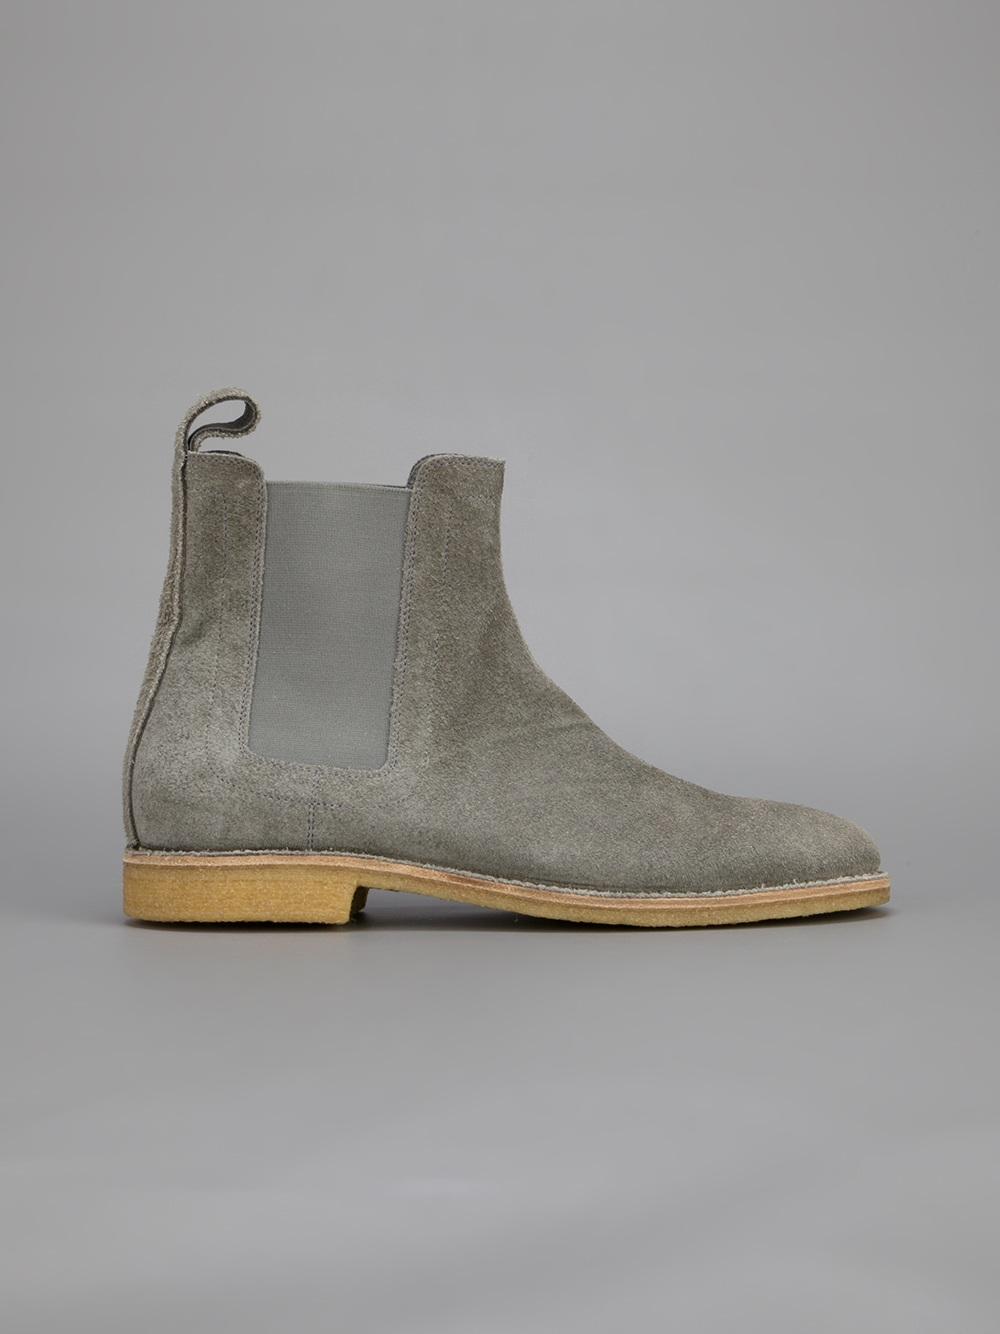 2c3c8166284 Bottega Veneta Gray Buffalo-Suede Chelsea Boots for men